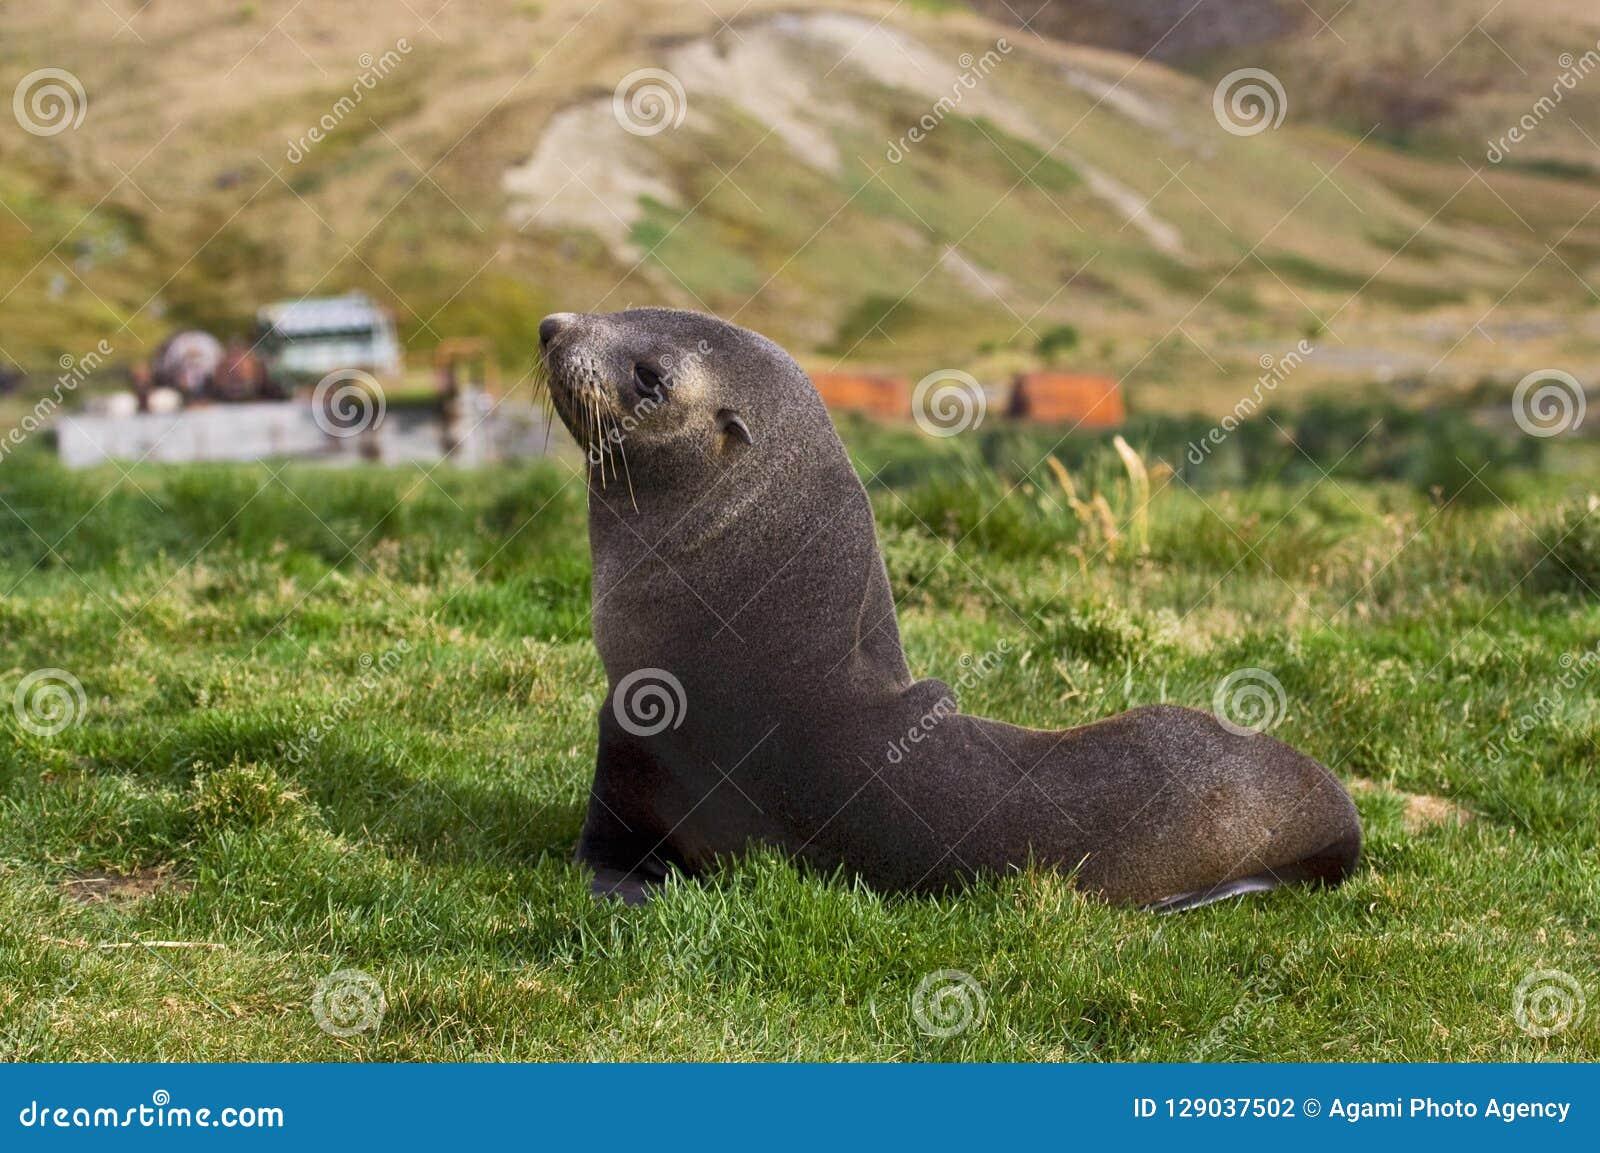 Antarctische Pelsrob, guarnizione di pelliccia antartica, arctocephalus gazella